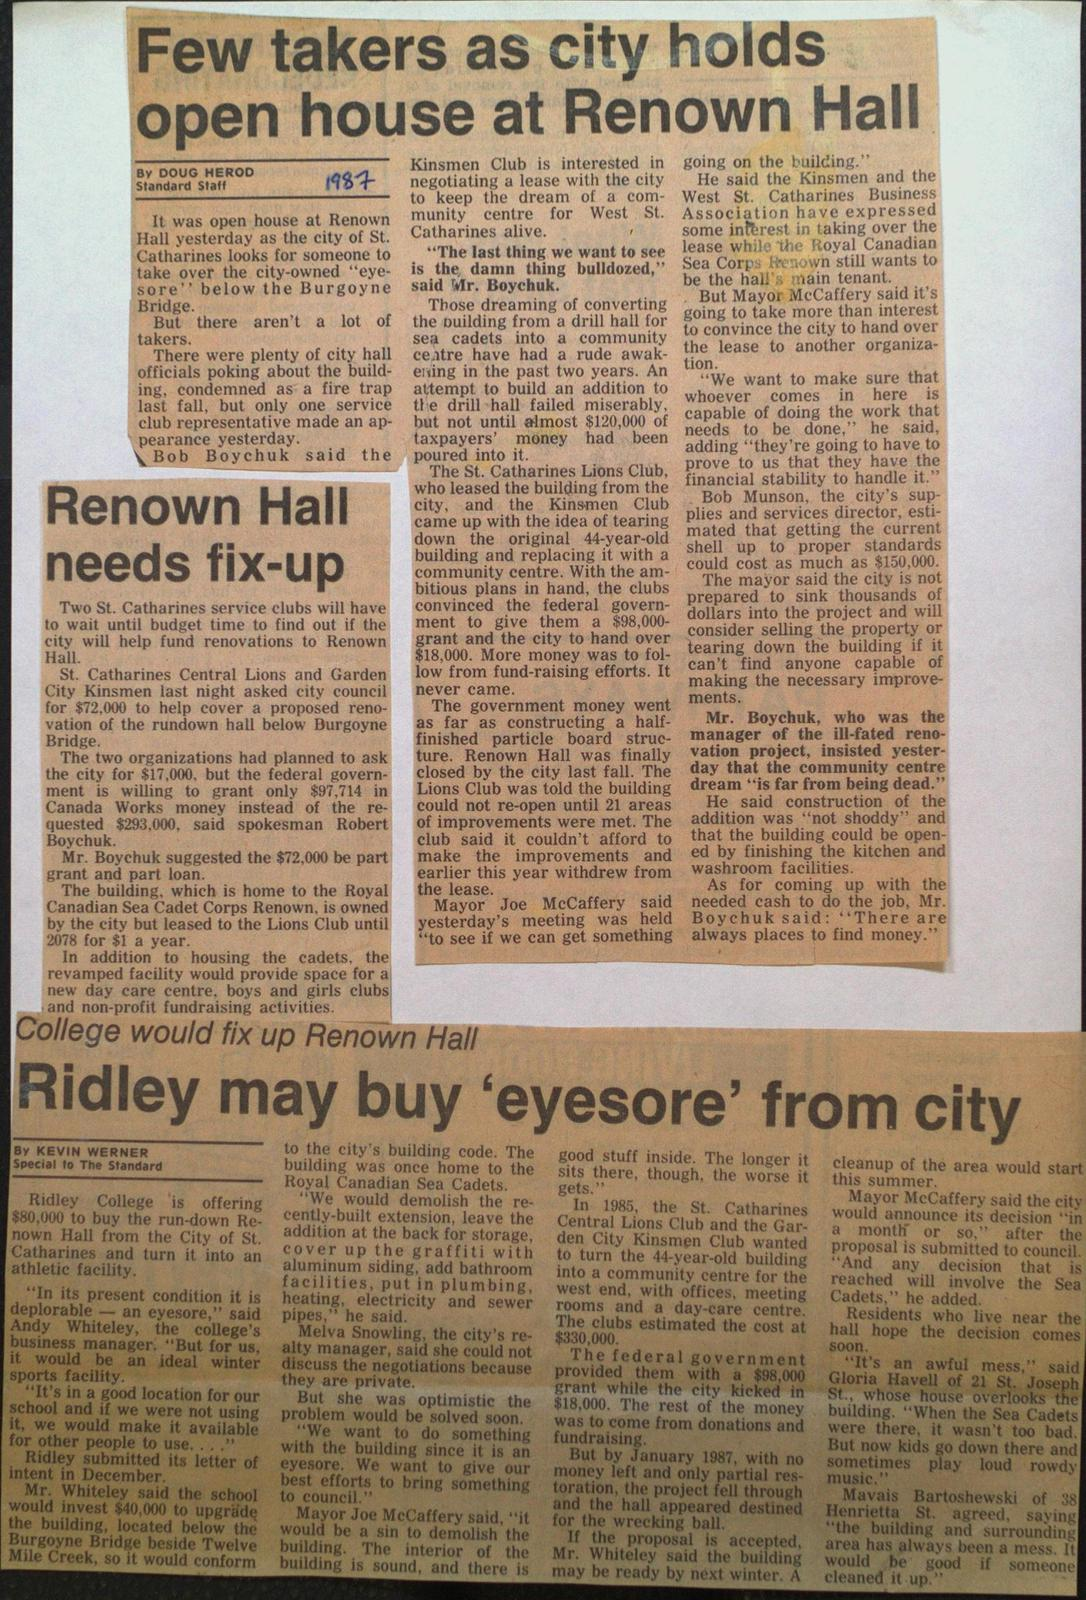 Renown Hall Needs Fixing Up